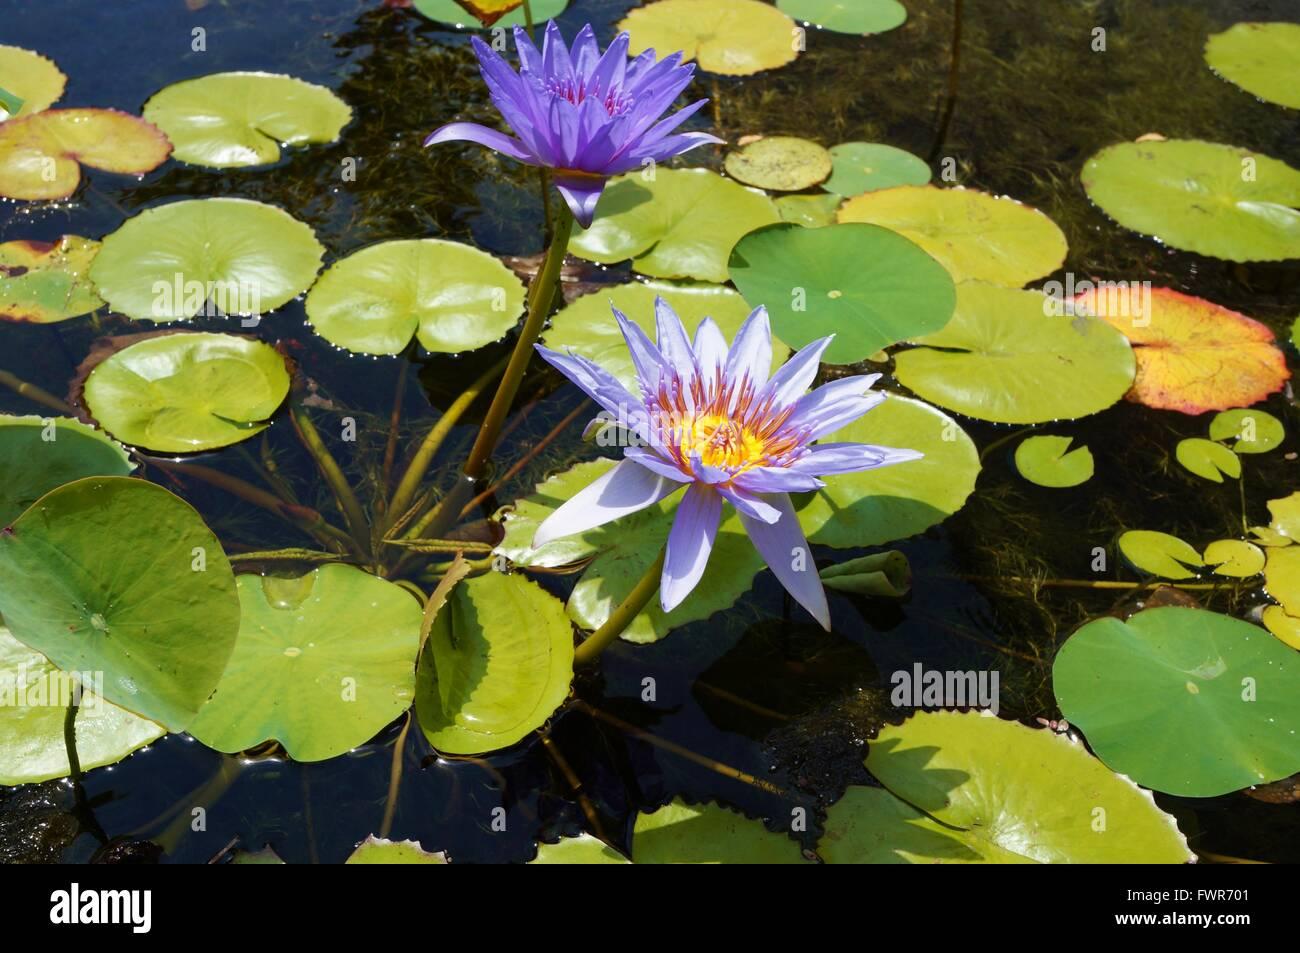 Purple Aquatic Waterlily Lotus Flowers In A Pond In Hawaii Stock